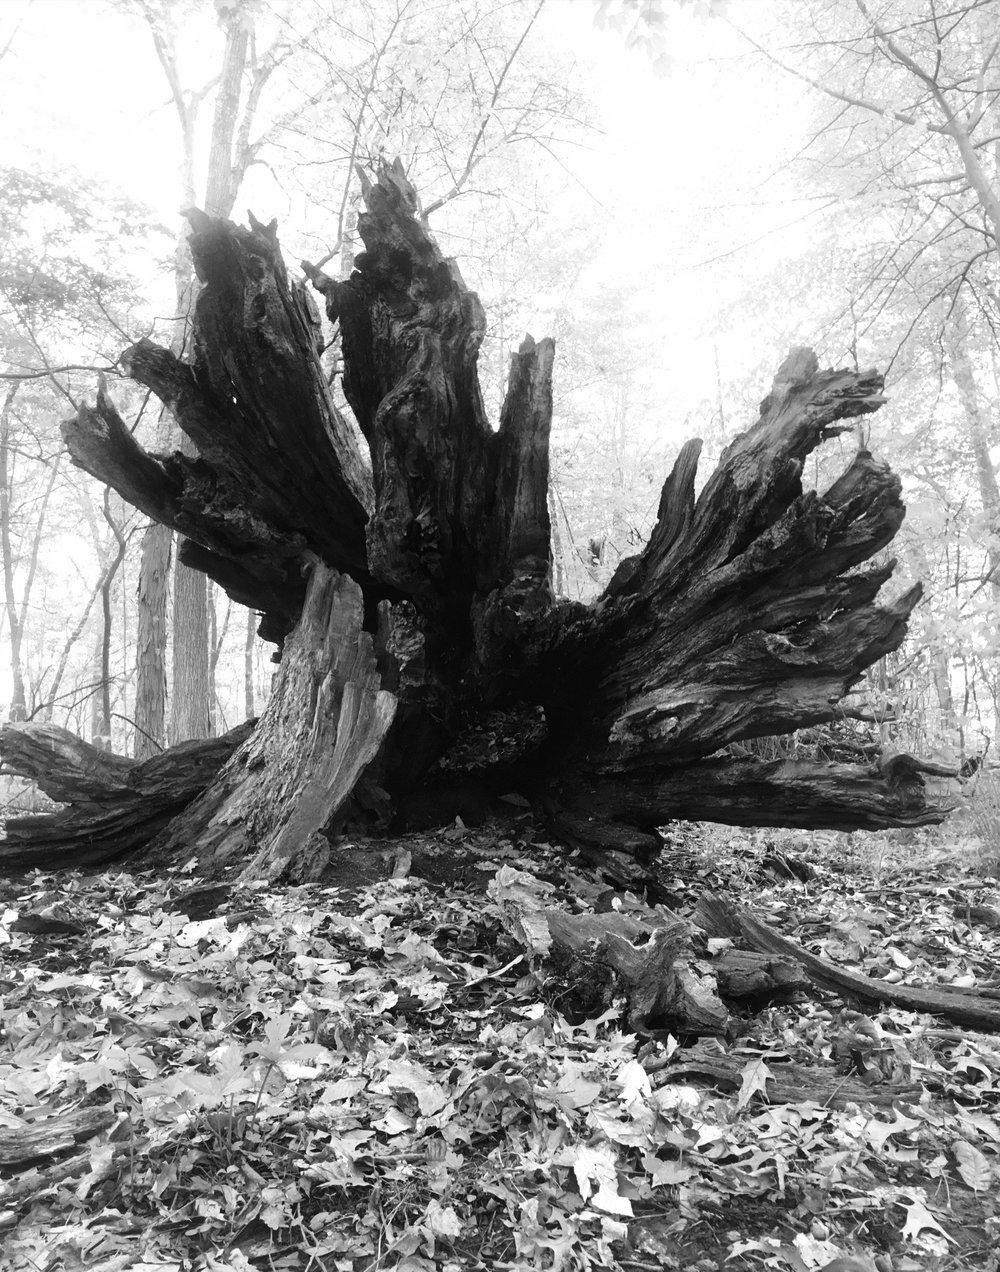 TreeFallenB&W03may43if.jpg